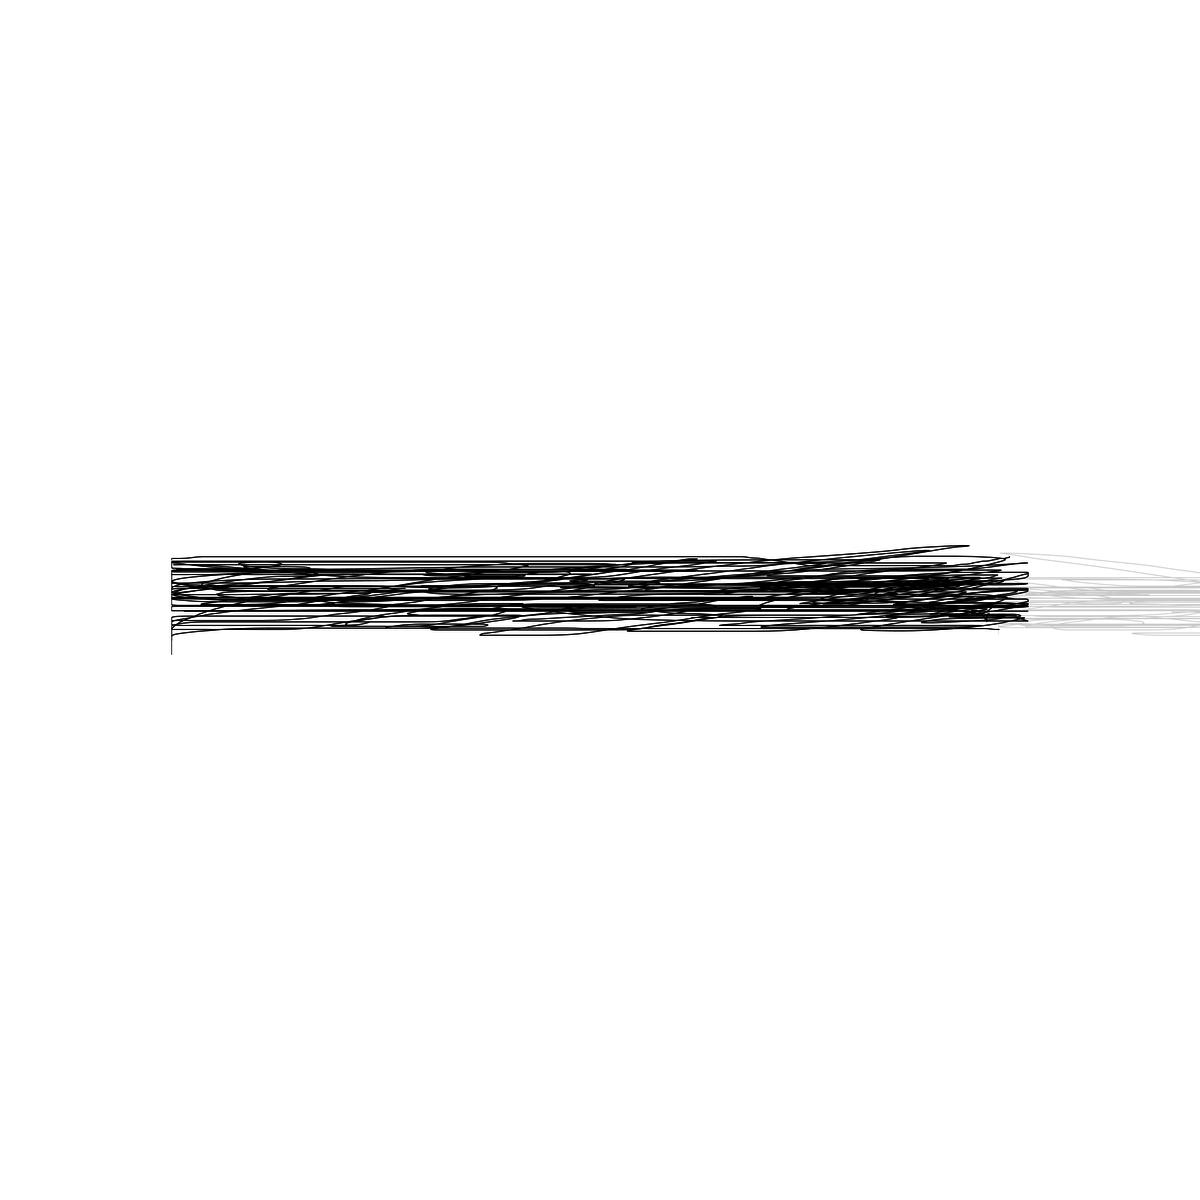 BAAAM drawing#11448 lat:52.4760055541992200lng: 13.4056692123413090